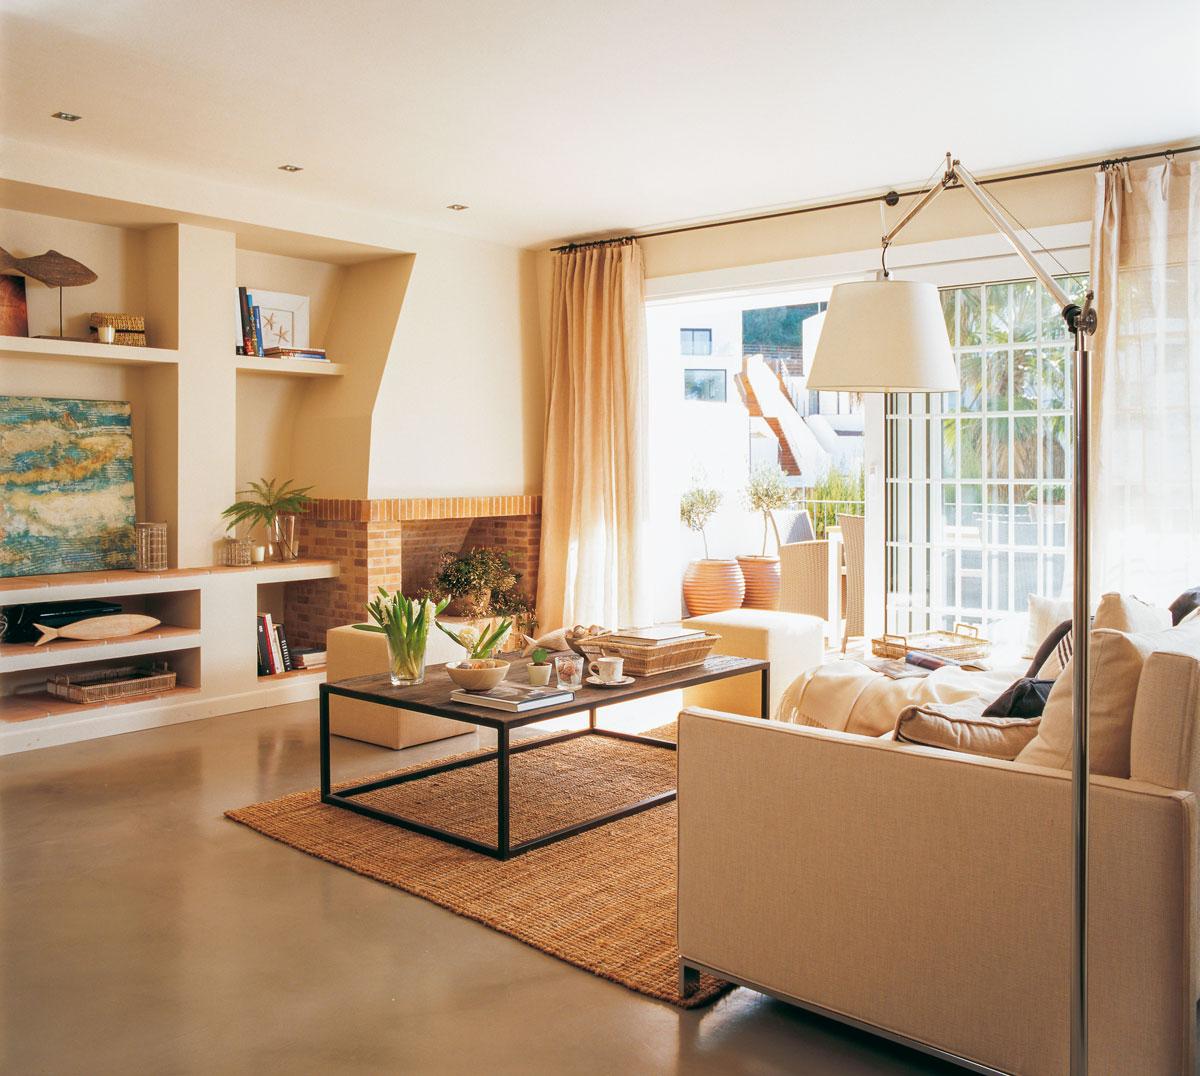 Decorar Mueble Salon Kvdd 30 Ideas De Decoracià N Para El Salà N